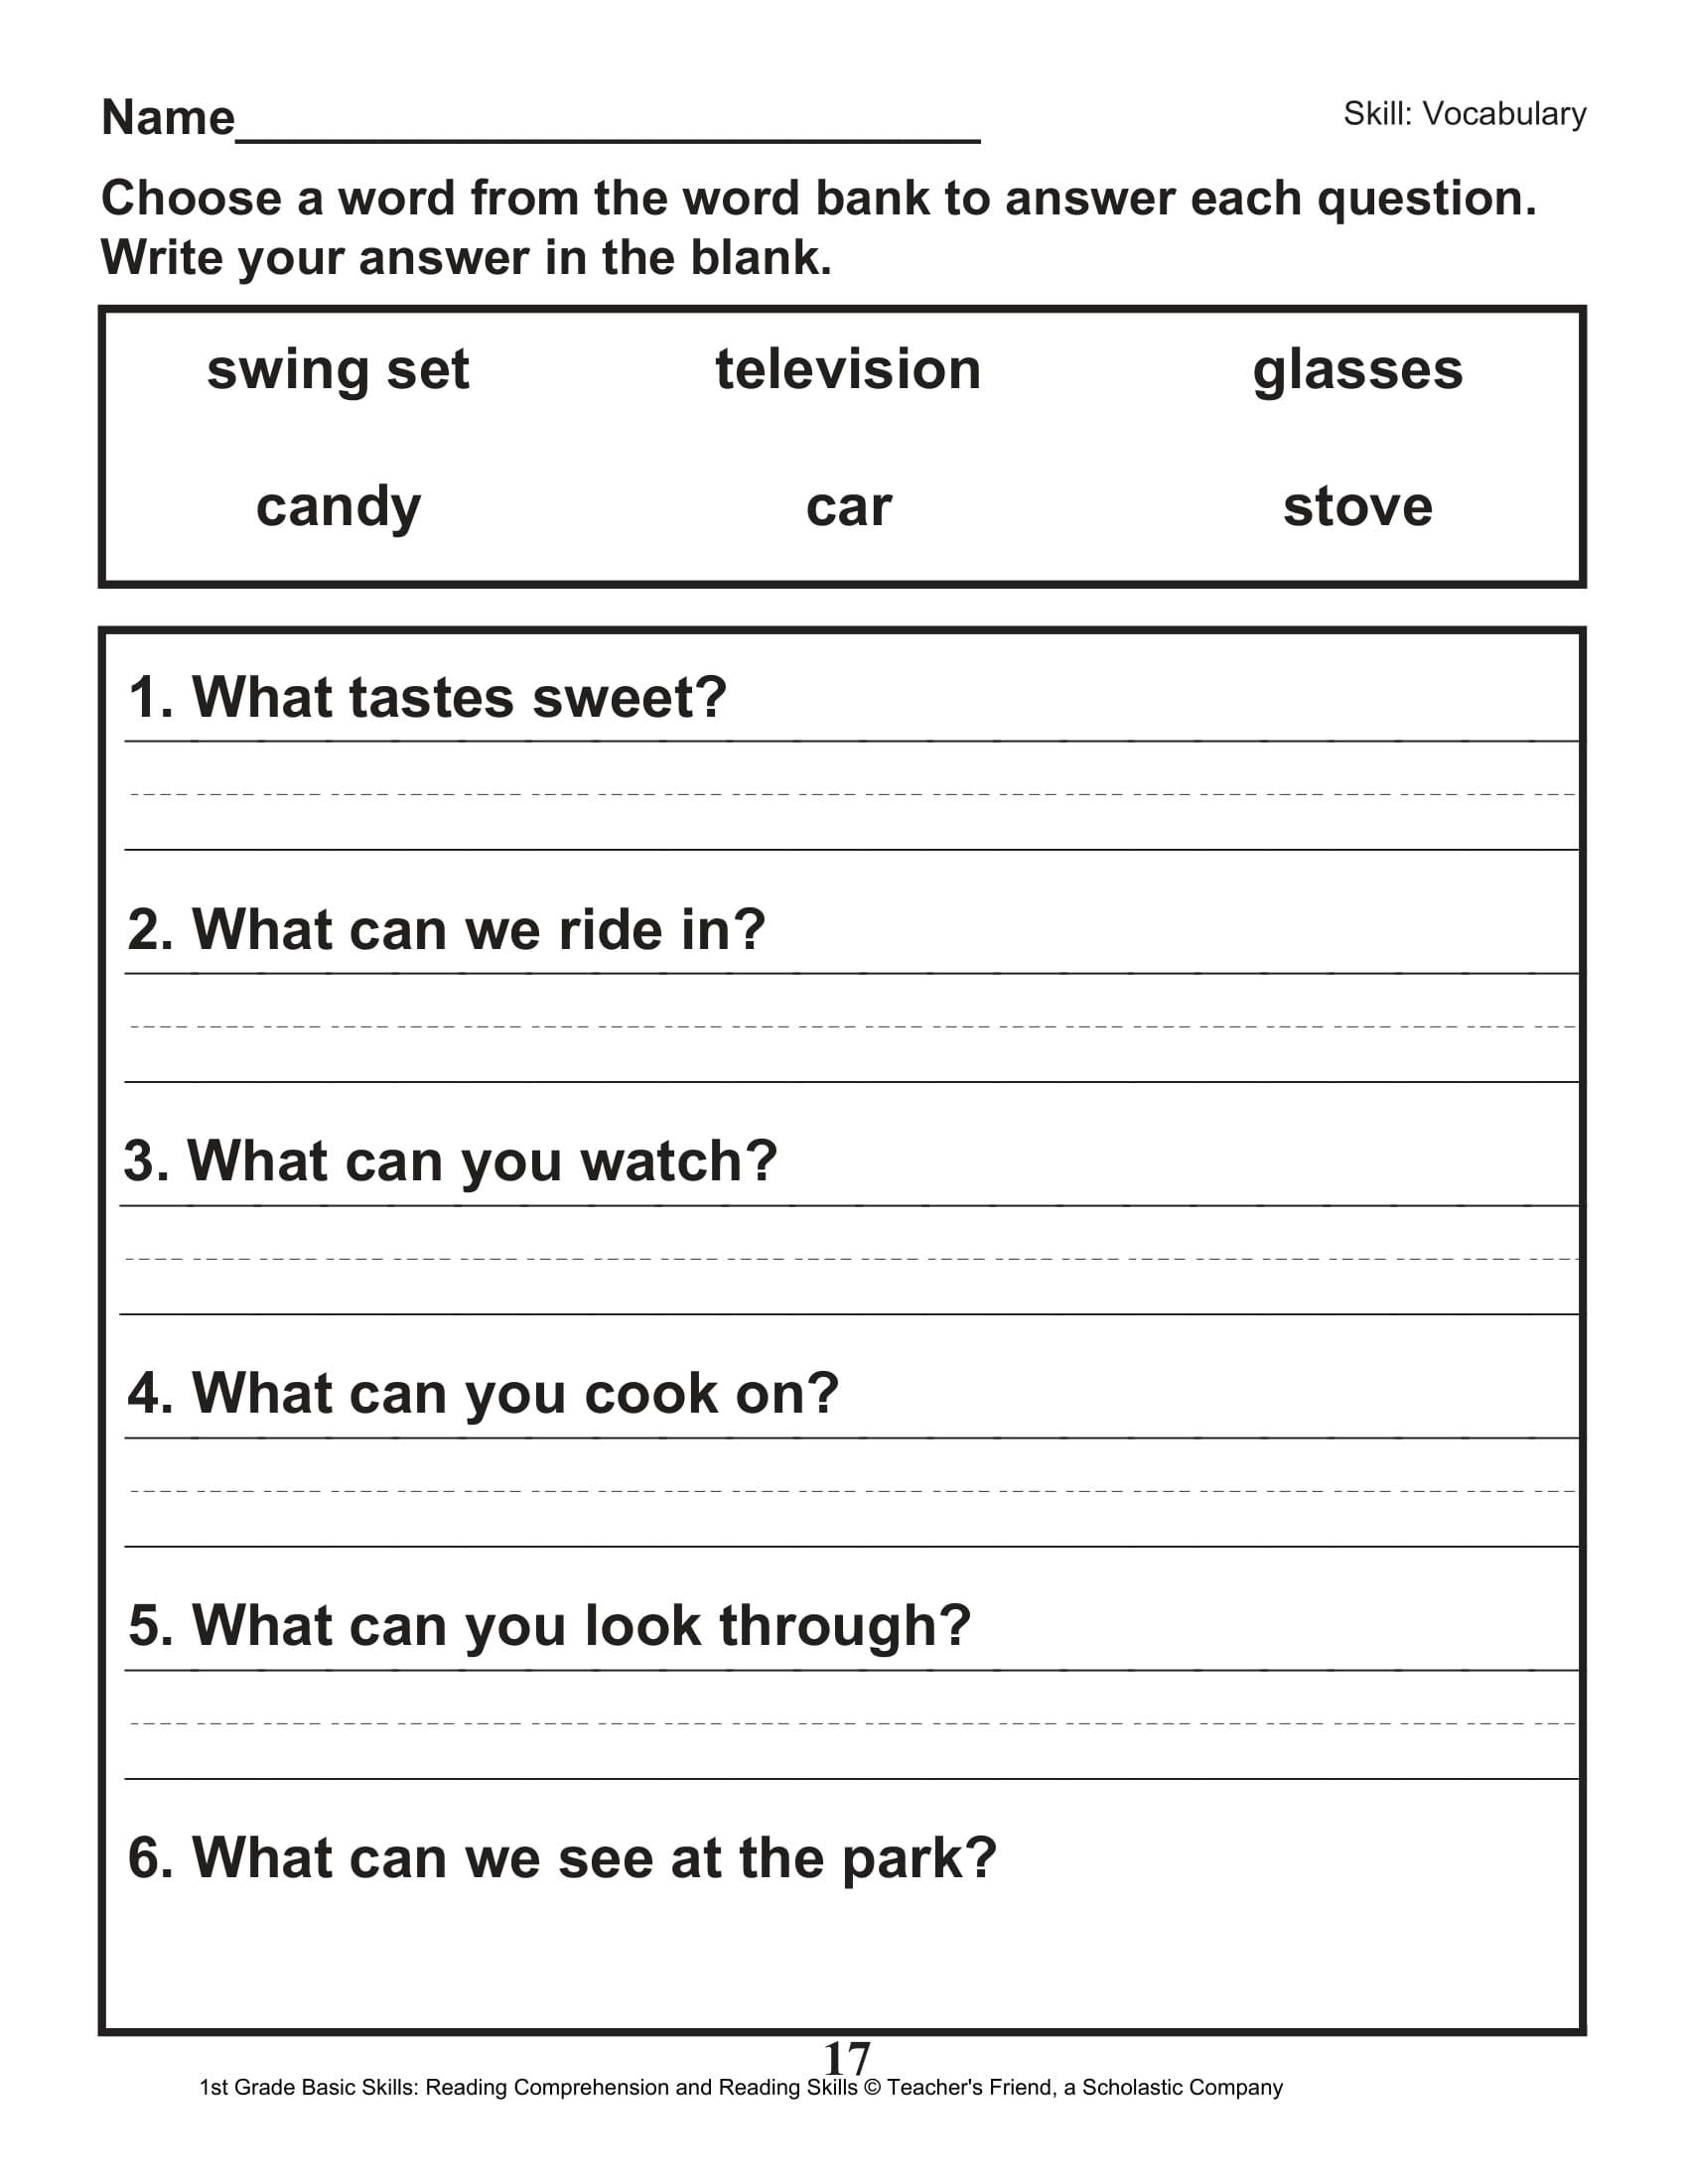 40 Scholastic 1st Grade Reading Comprehension Skills